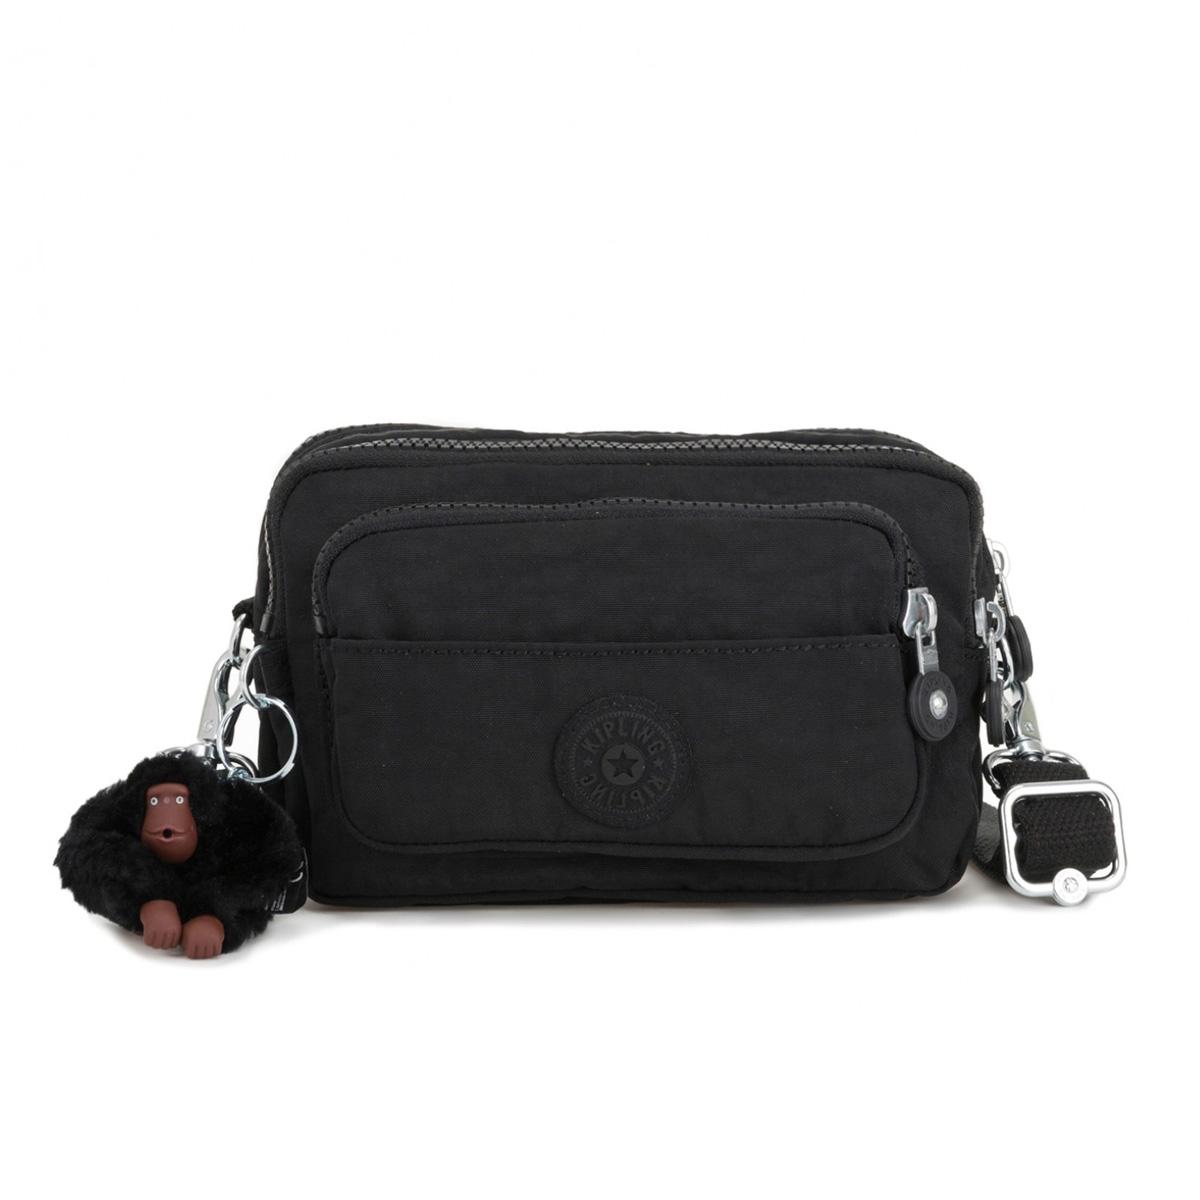 5ae115b488 Kipling Multiple Waist Bag Convertible to Shoulder Bag - True Black ...